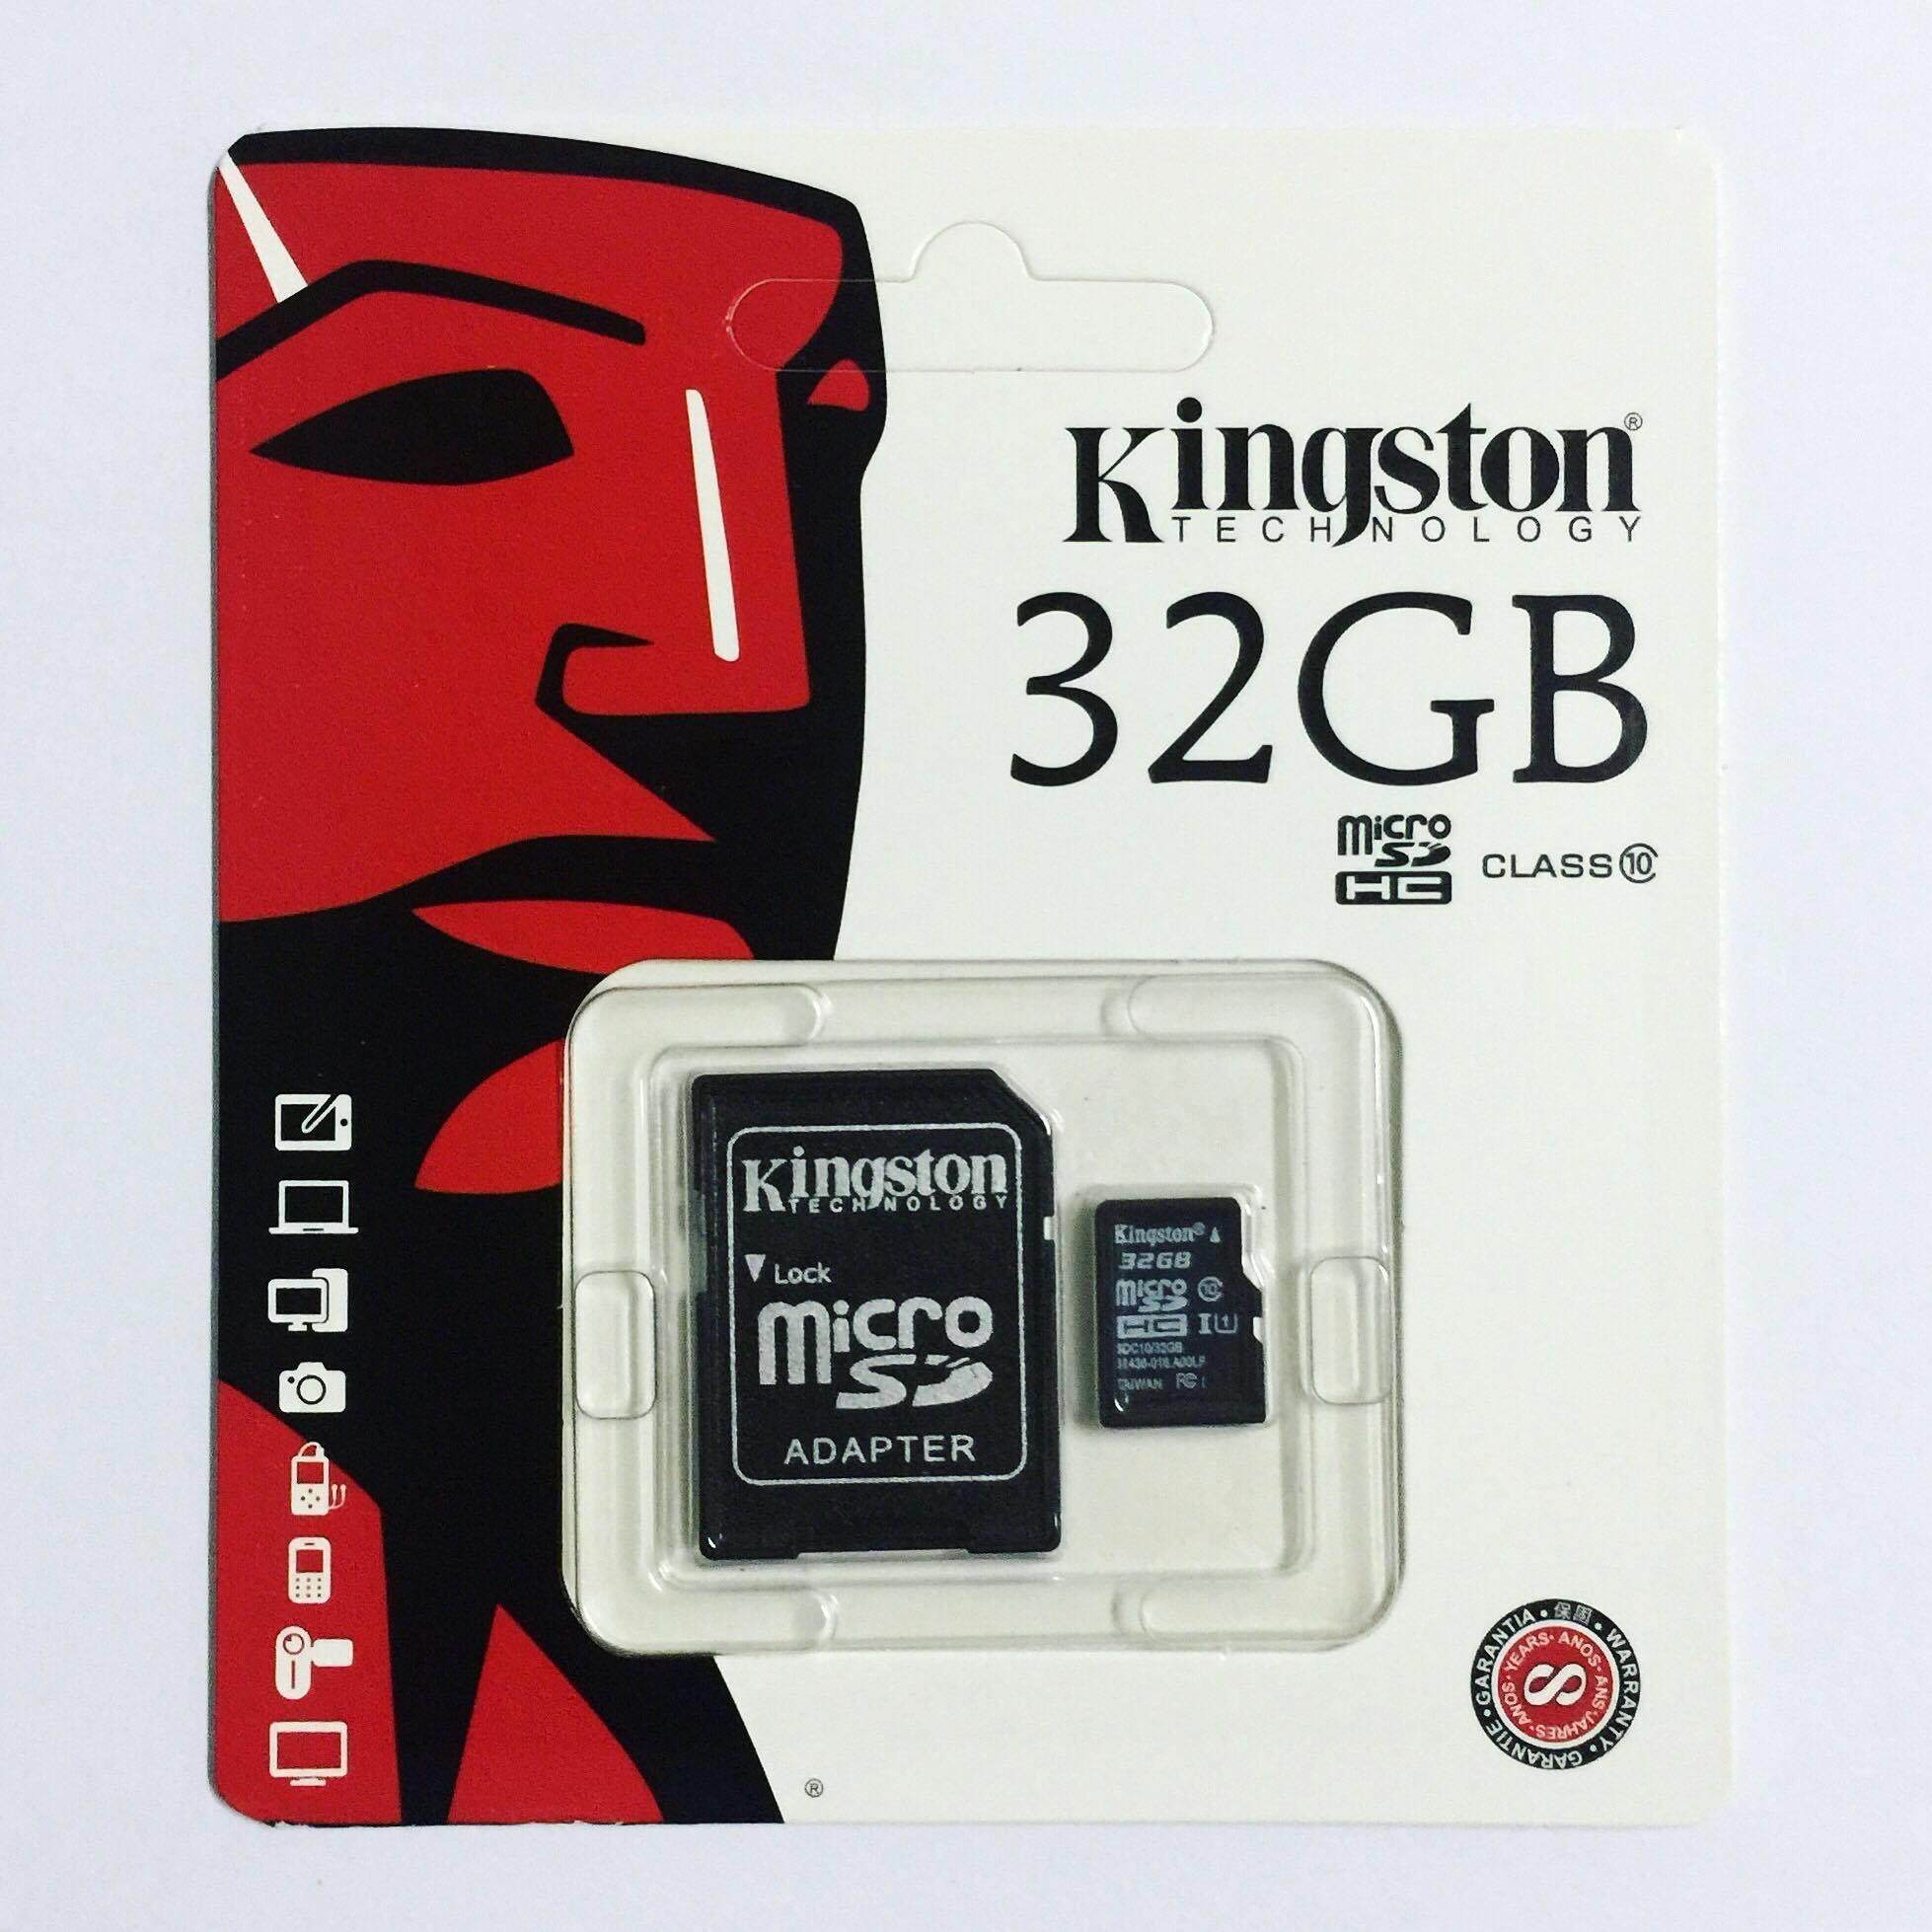 Kingston Memory Card Micro SD SDHC 32 GB Class 10 คิงส์ตัน เมมโมรี่การ์ด SD Card